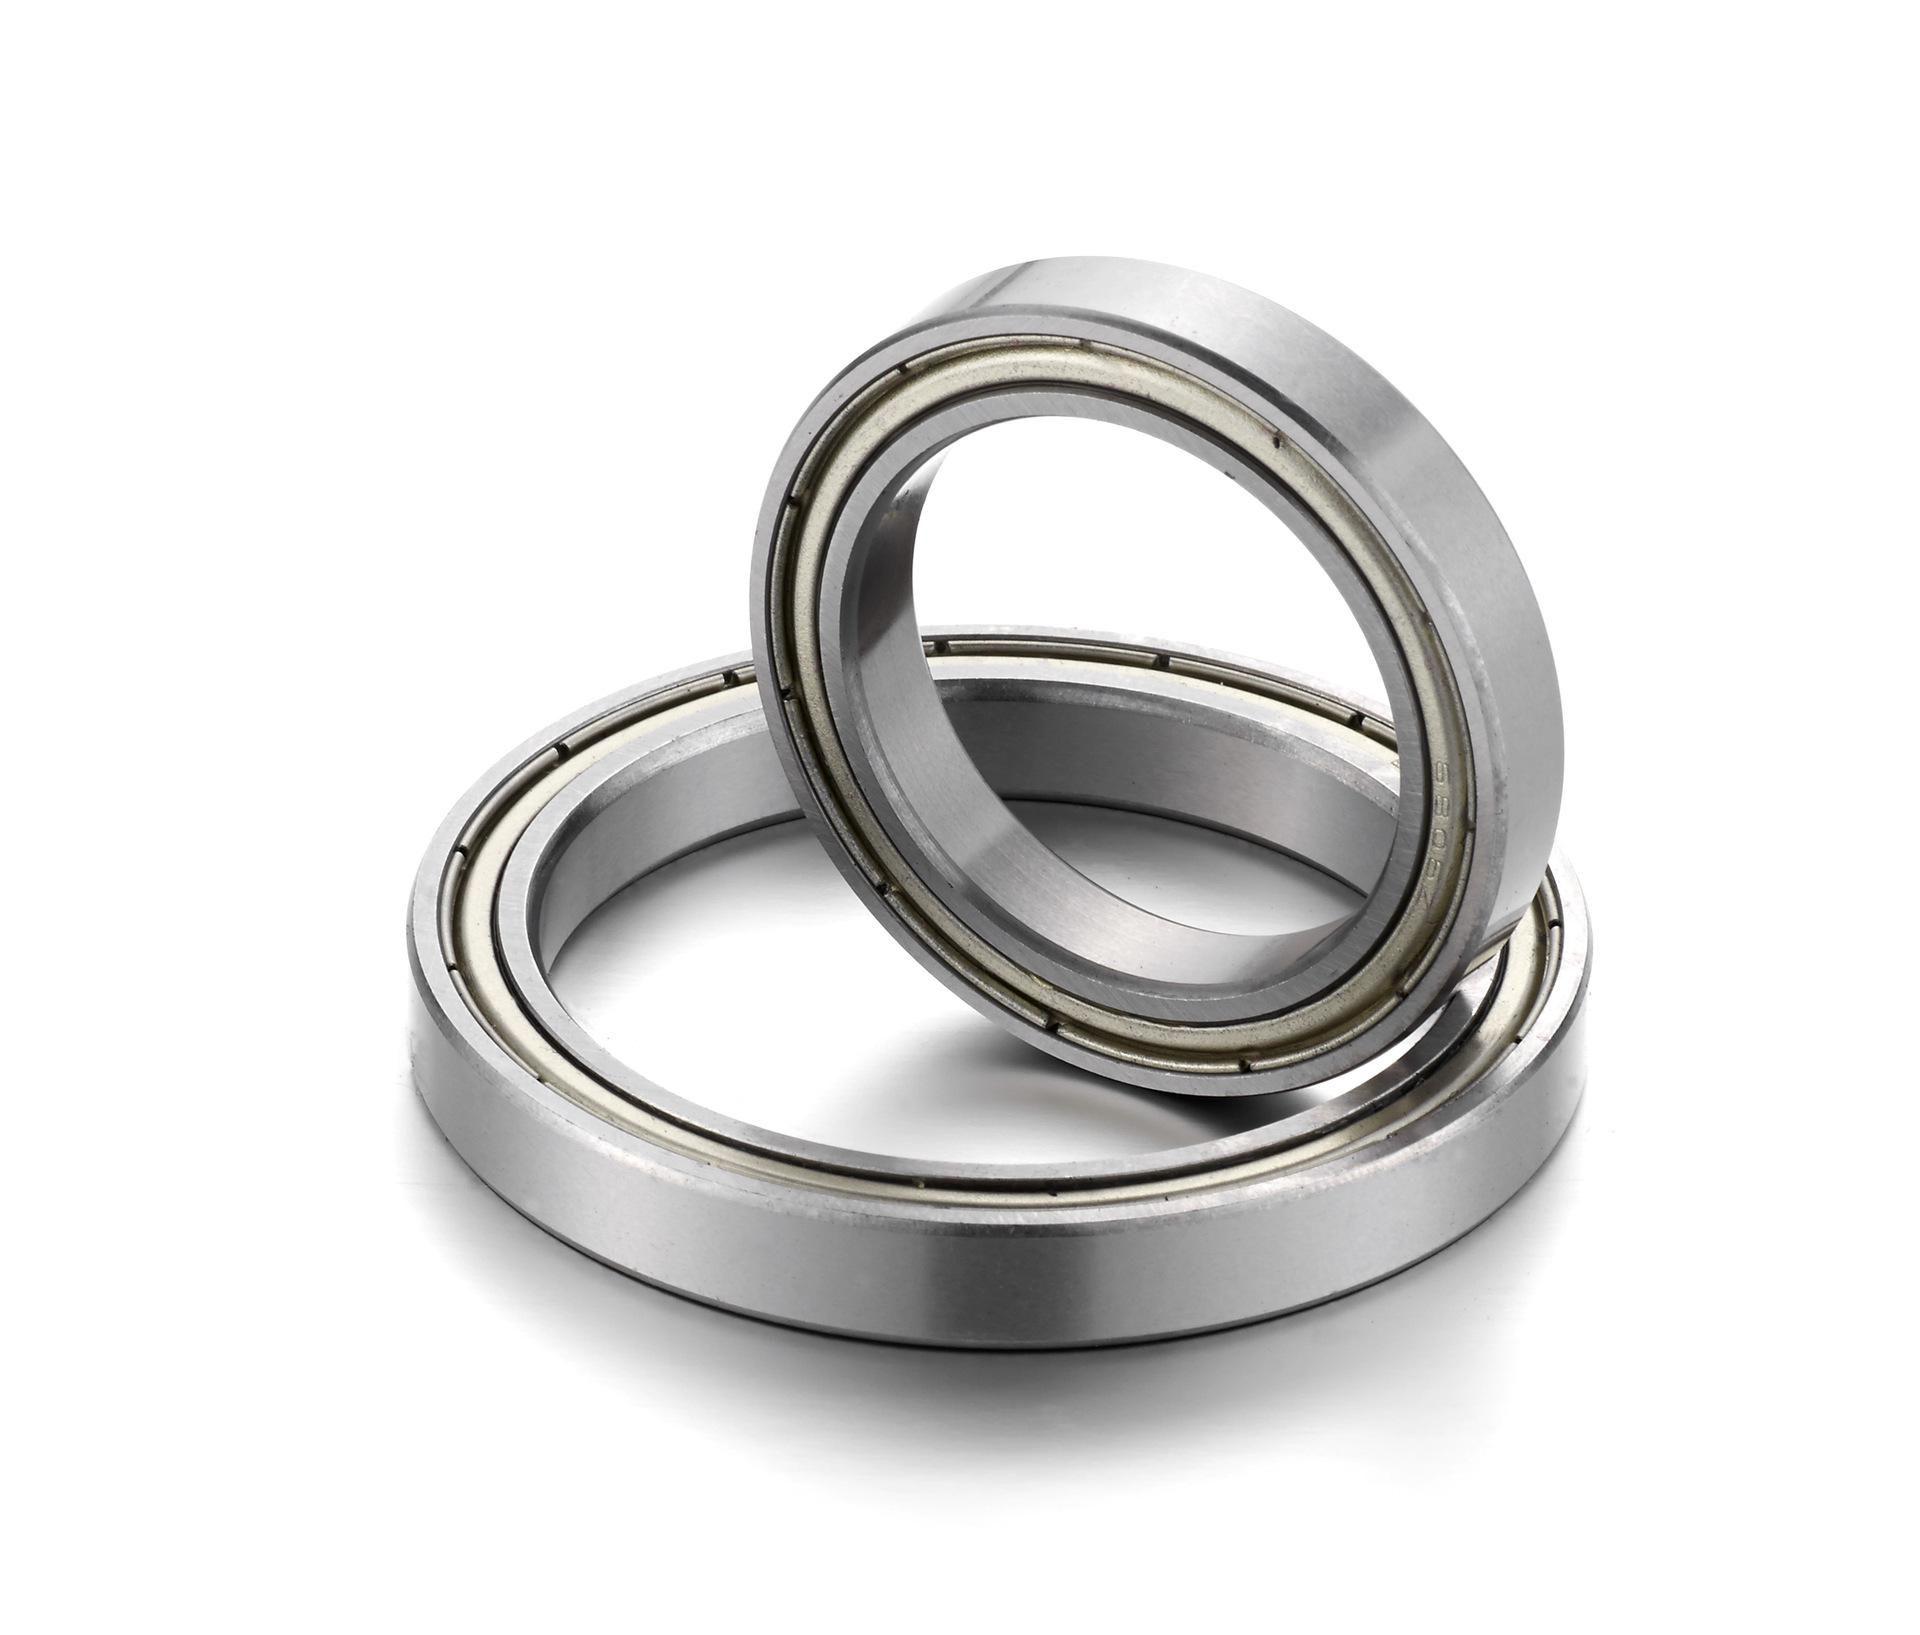 ФОТО S51210 50x78x22mm 50*78*22mm stainless steel thrust ball bearing 51210